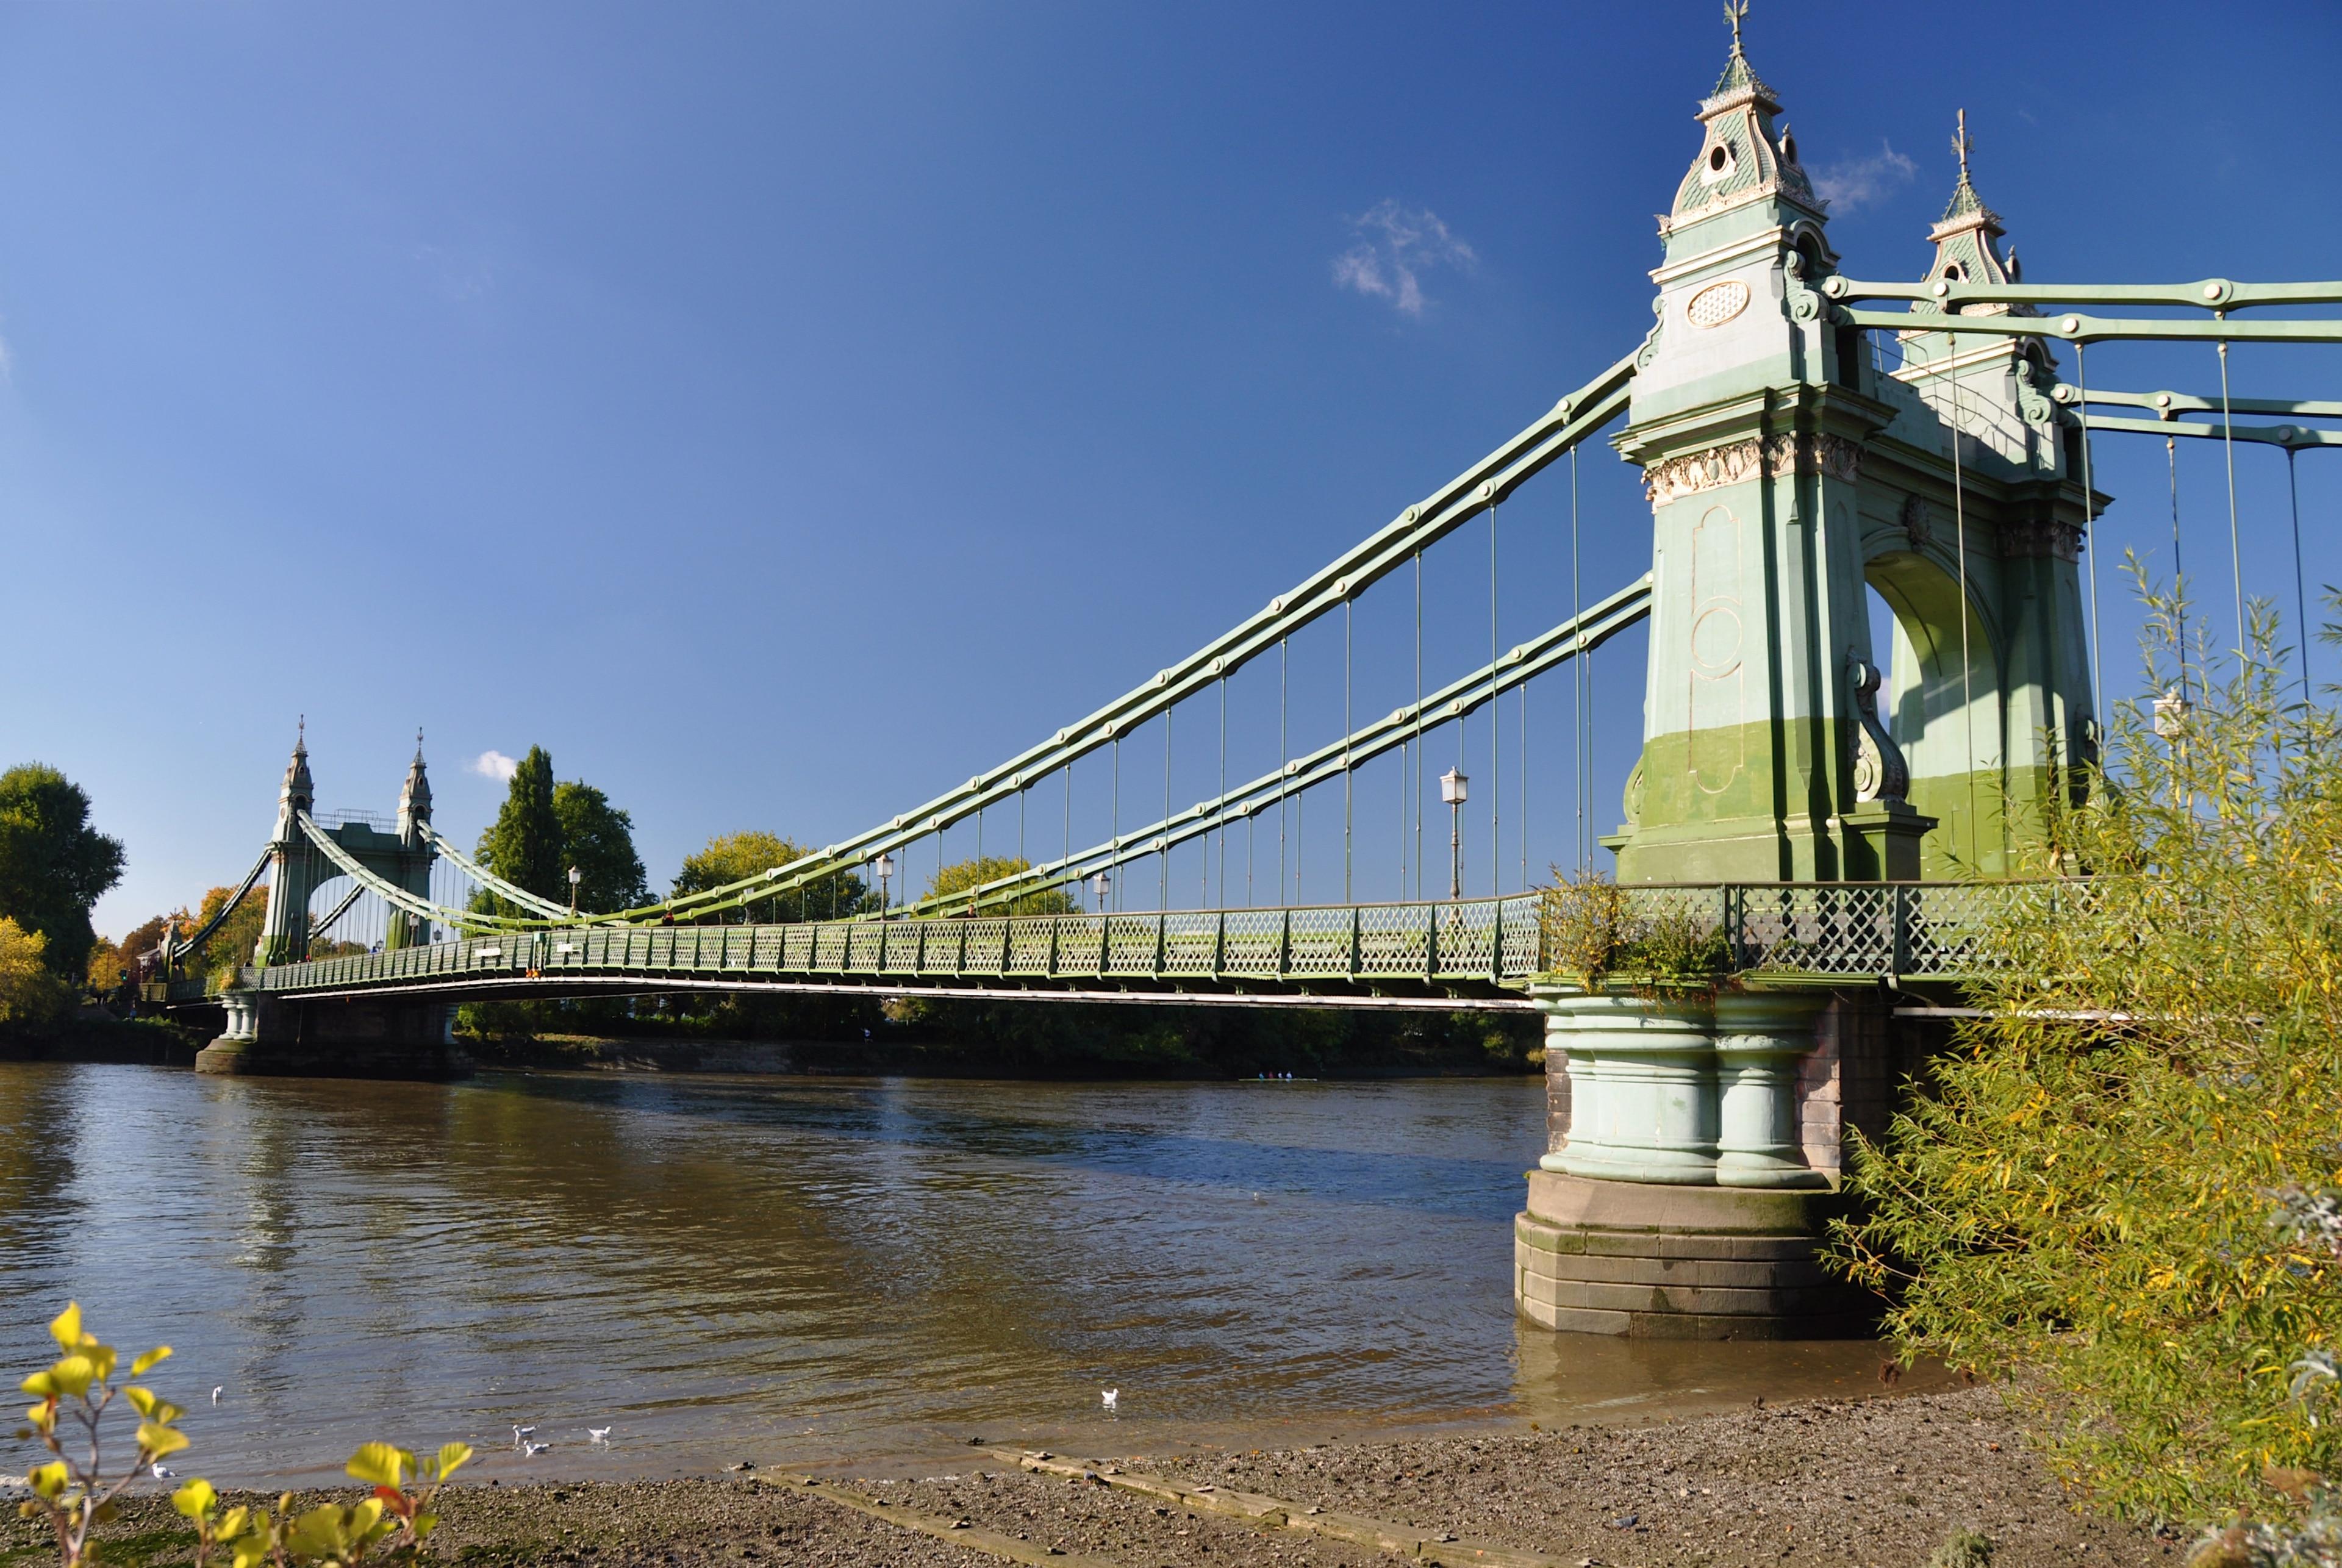 Hammersmith, Londen, Engeland, Verenigd Koninkrijk